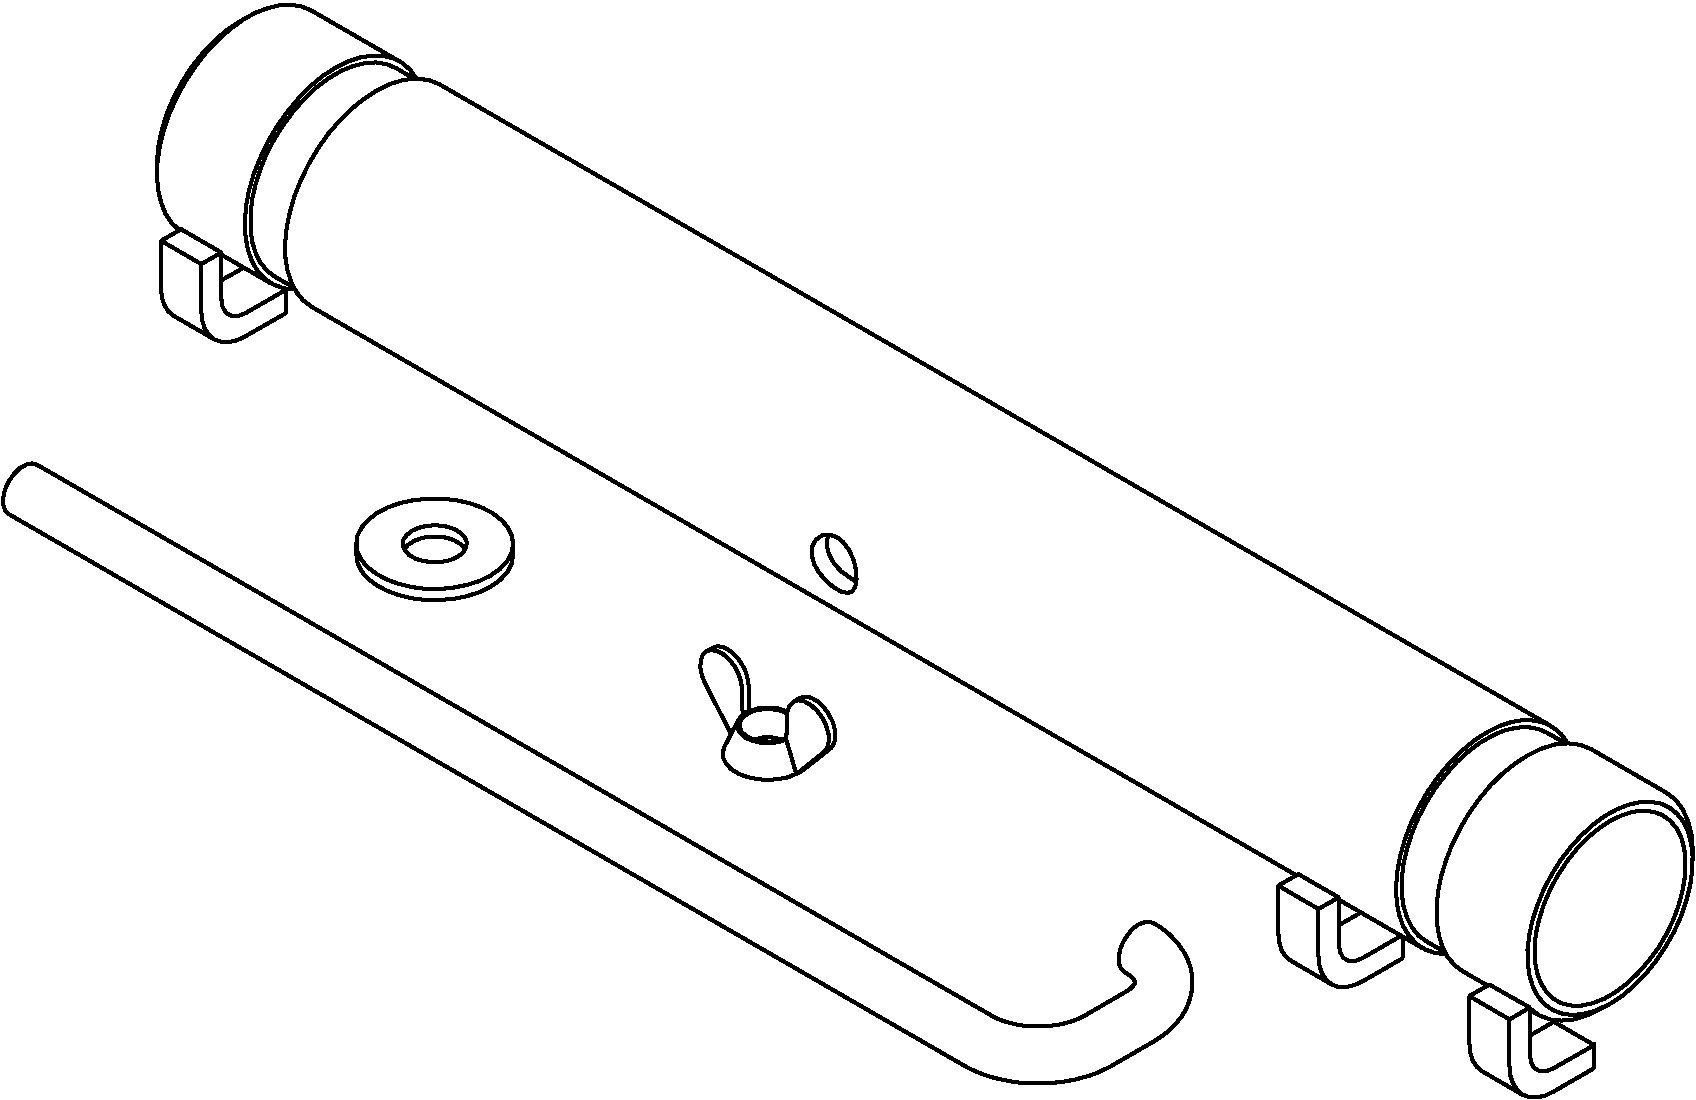 Coil Spring Compressor Adapter Tool J 15